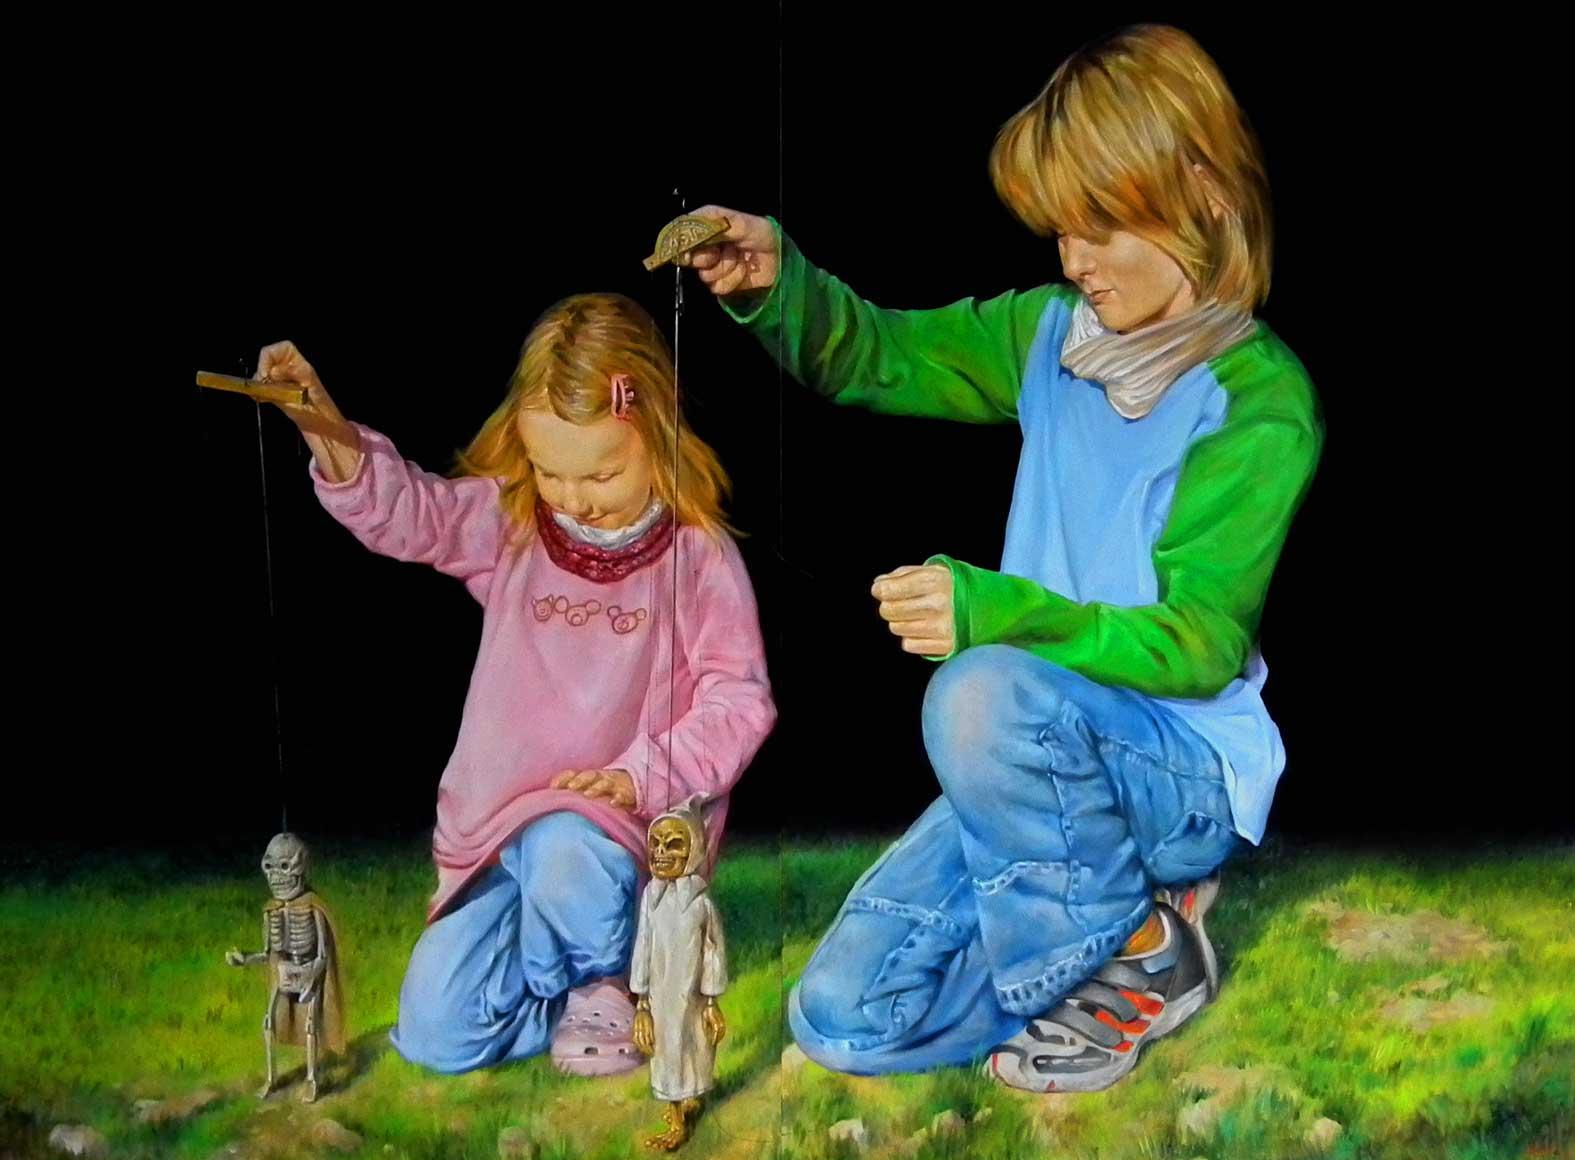 Cosima und Damian 2012 Oel auf Lnwd 150x200cm